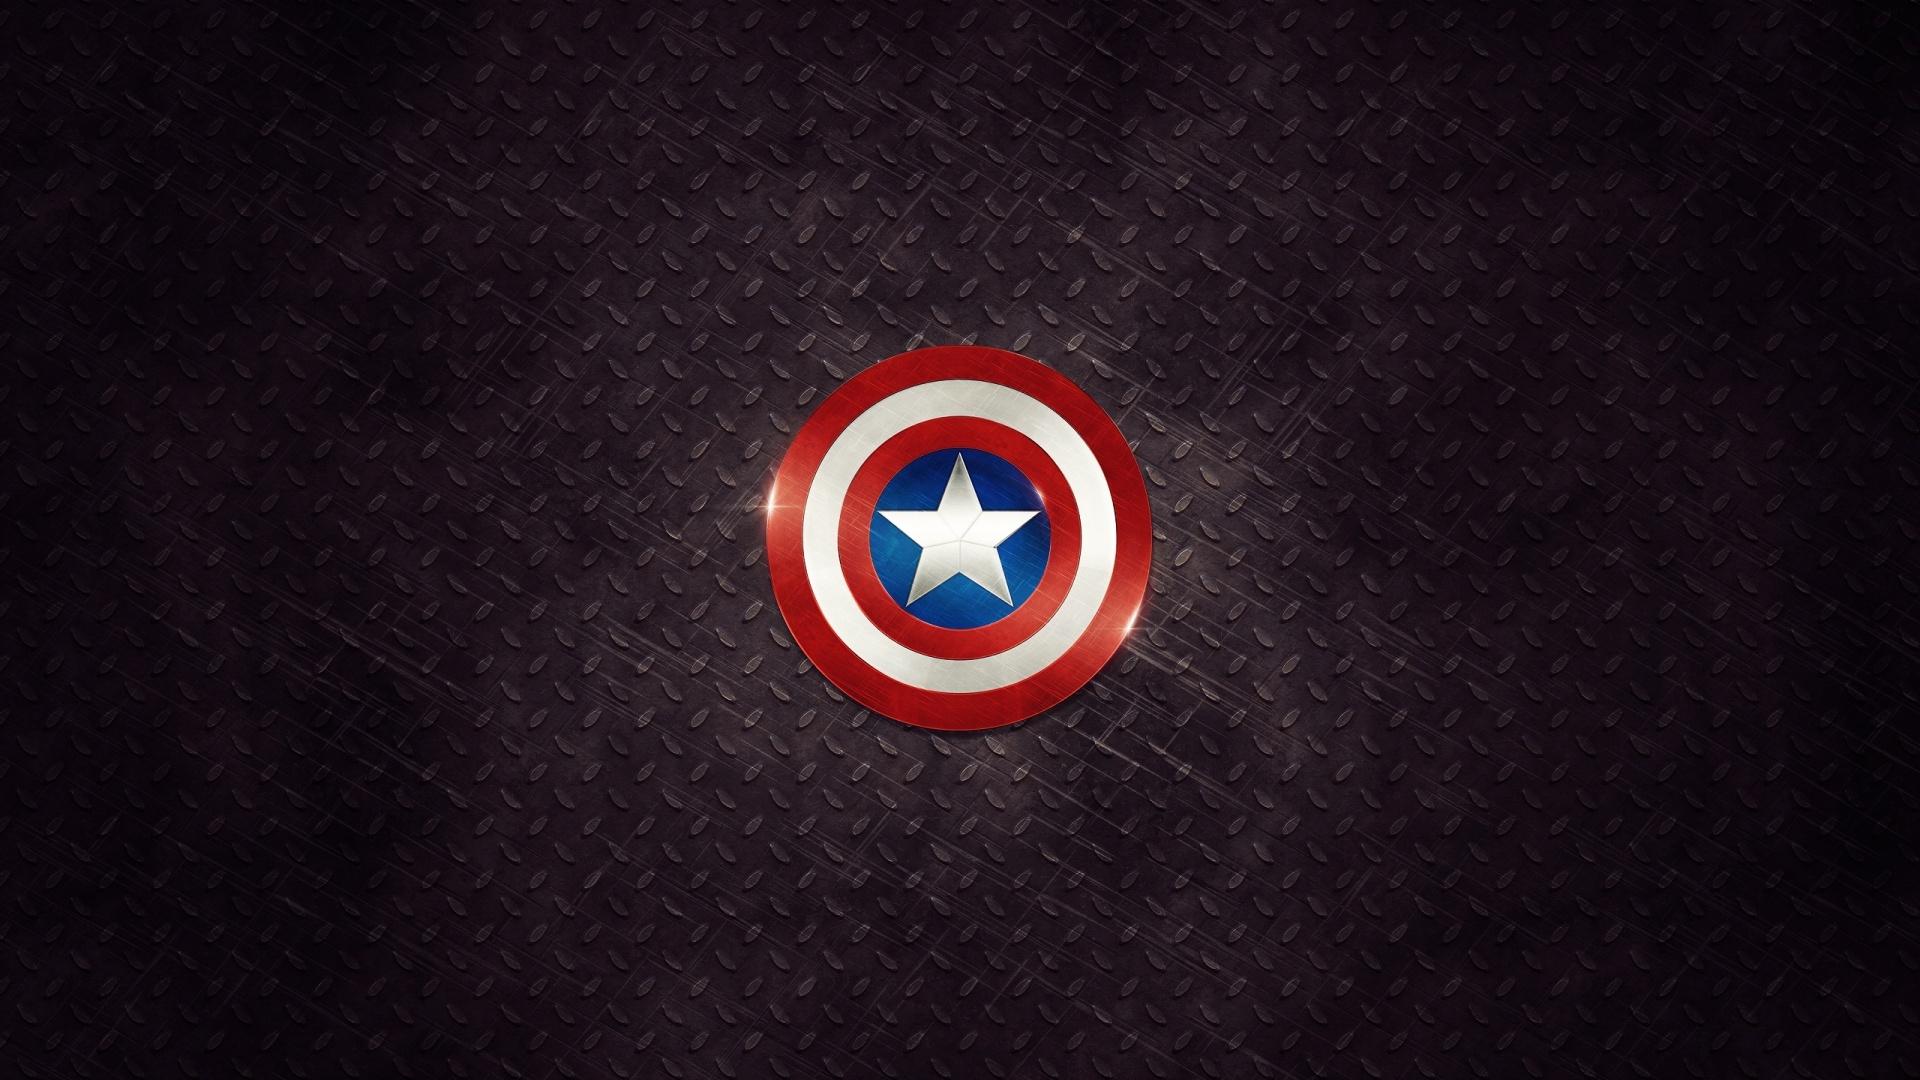 captain america logo wallpaper #50